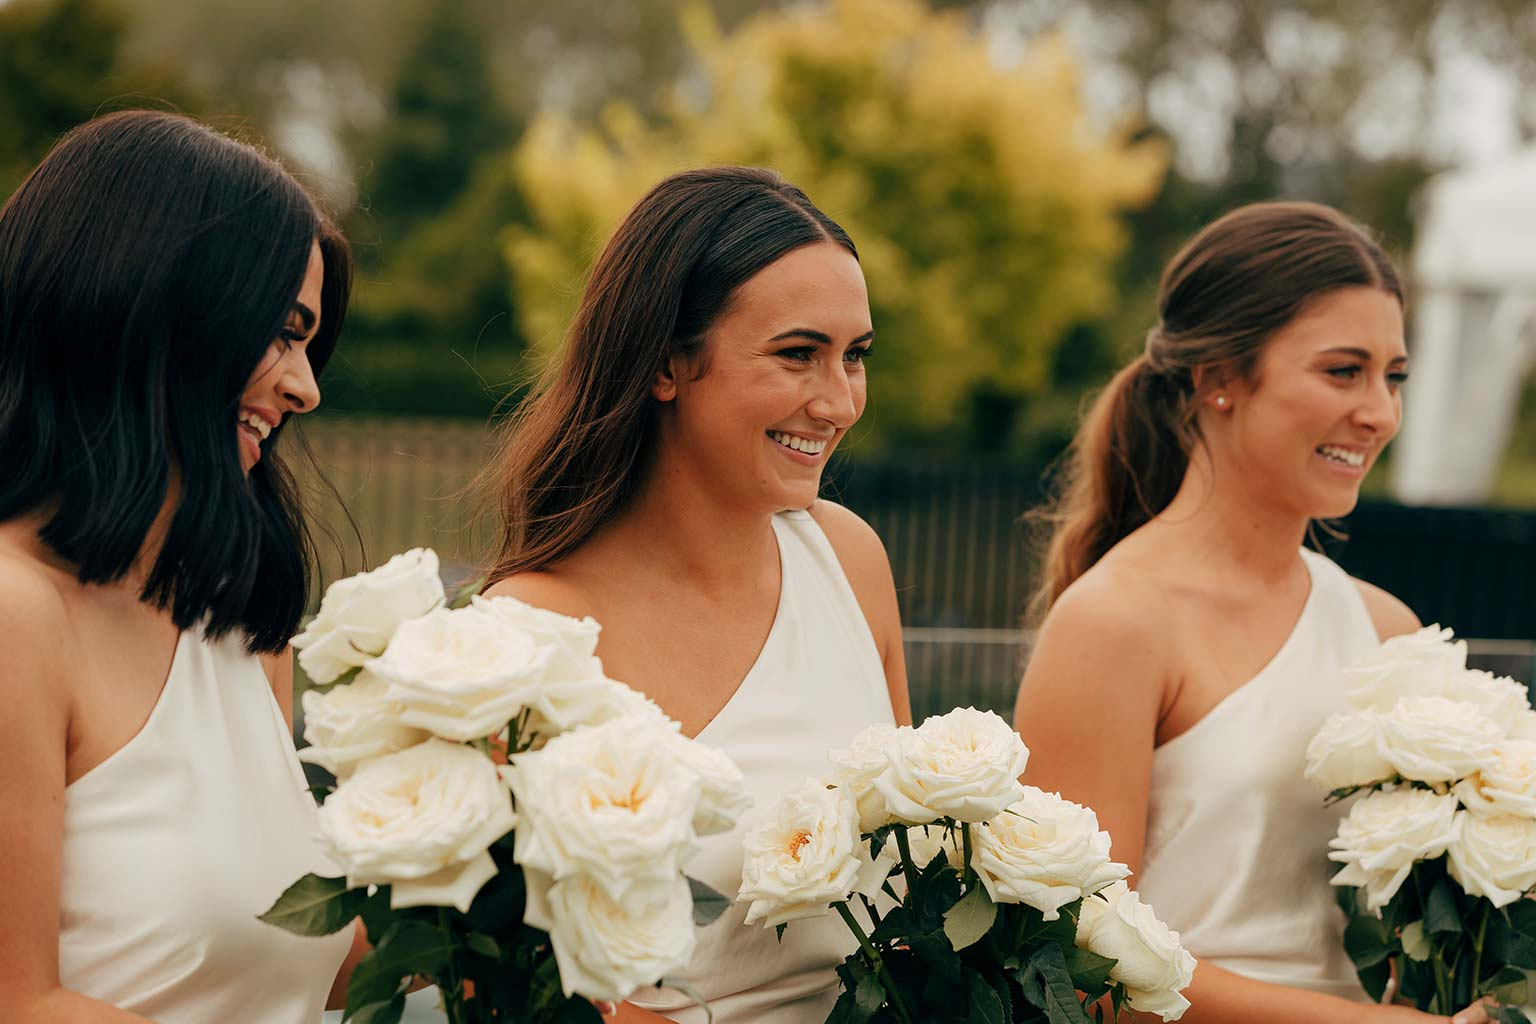 Vinka Design Bridal Wear features Real Wedding Matt and Emilia - bridesmaids